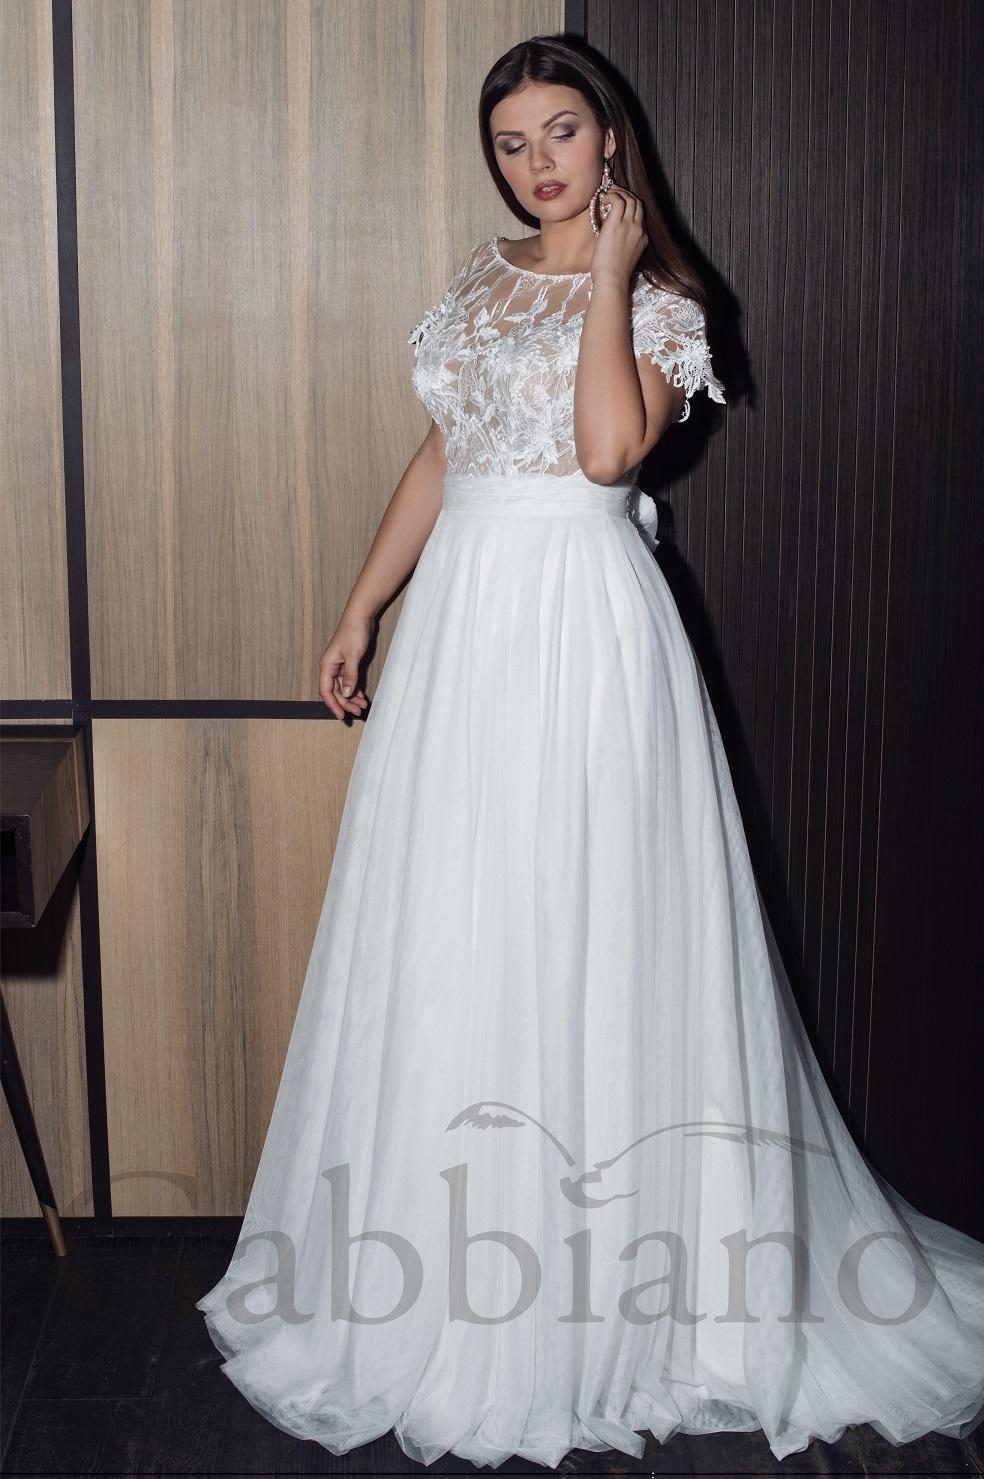 45f3aa50c16 1 фото. Ponti. Шифоновое свадебное платье ...